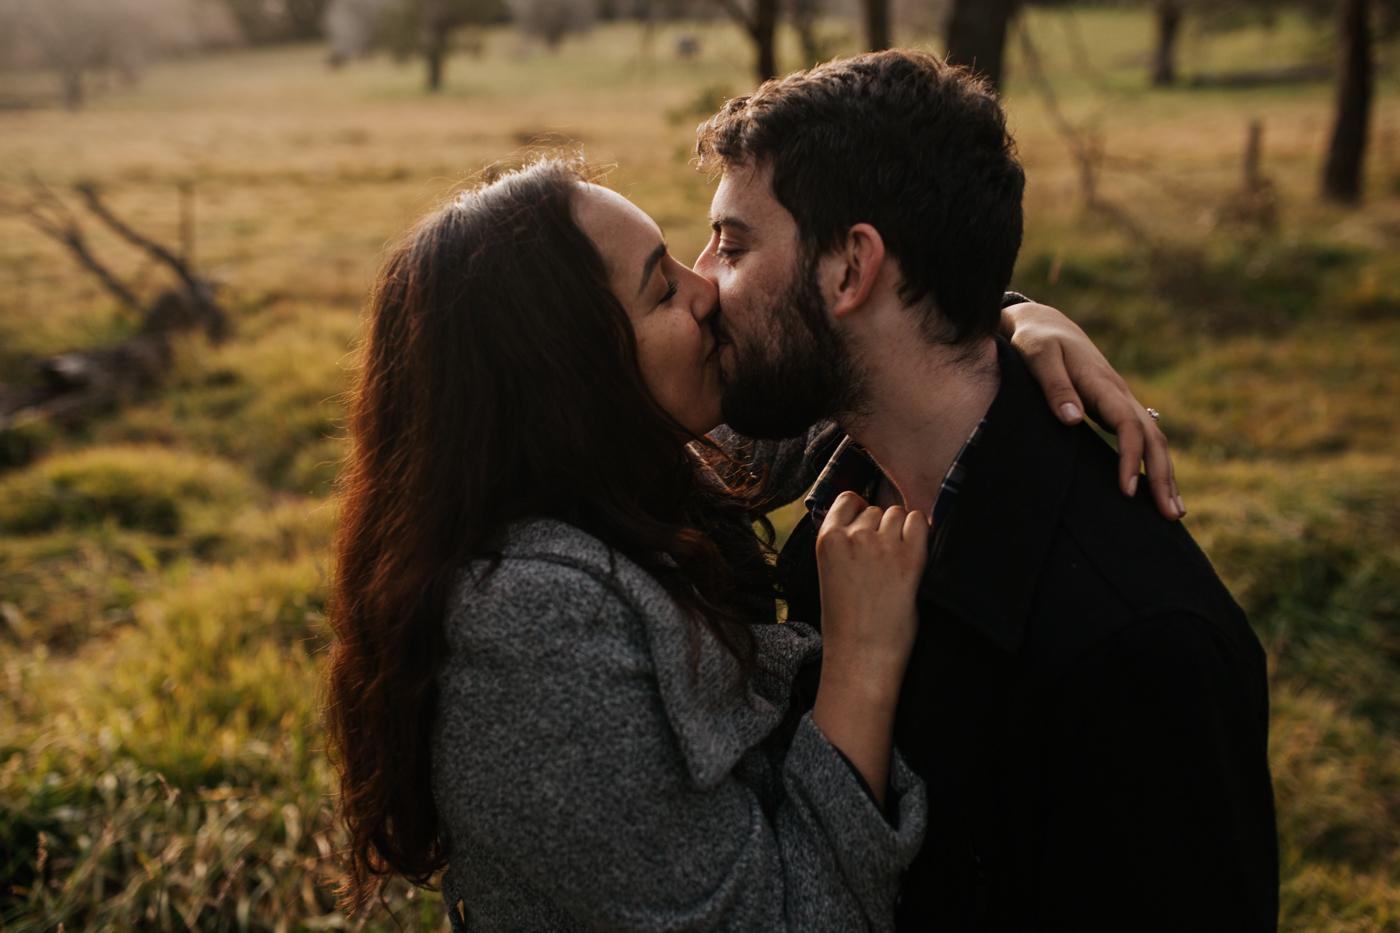 Kate & Kieran - Southern Highlands Engagement - Samantha Heather Photography-87.jpg